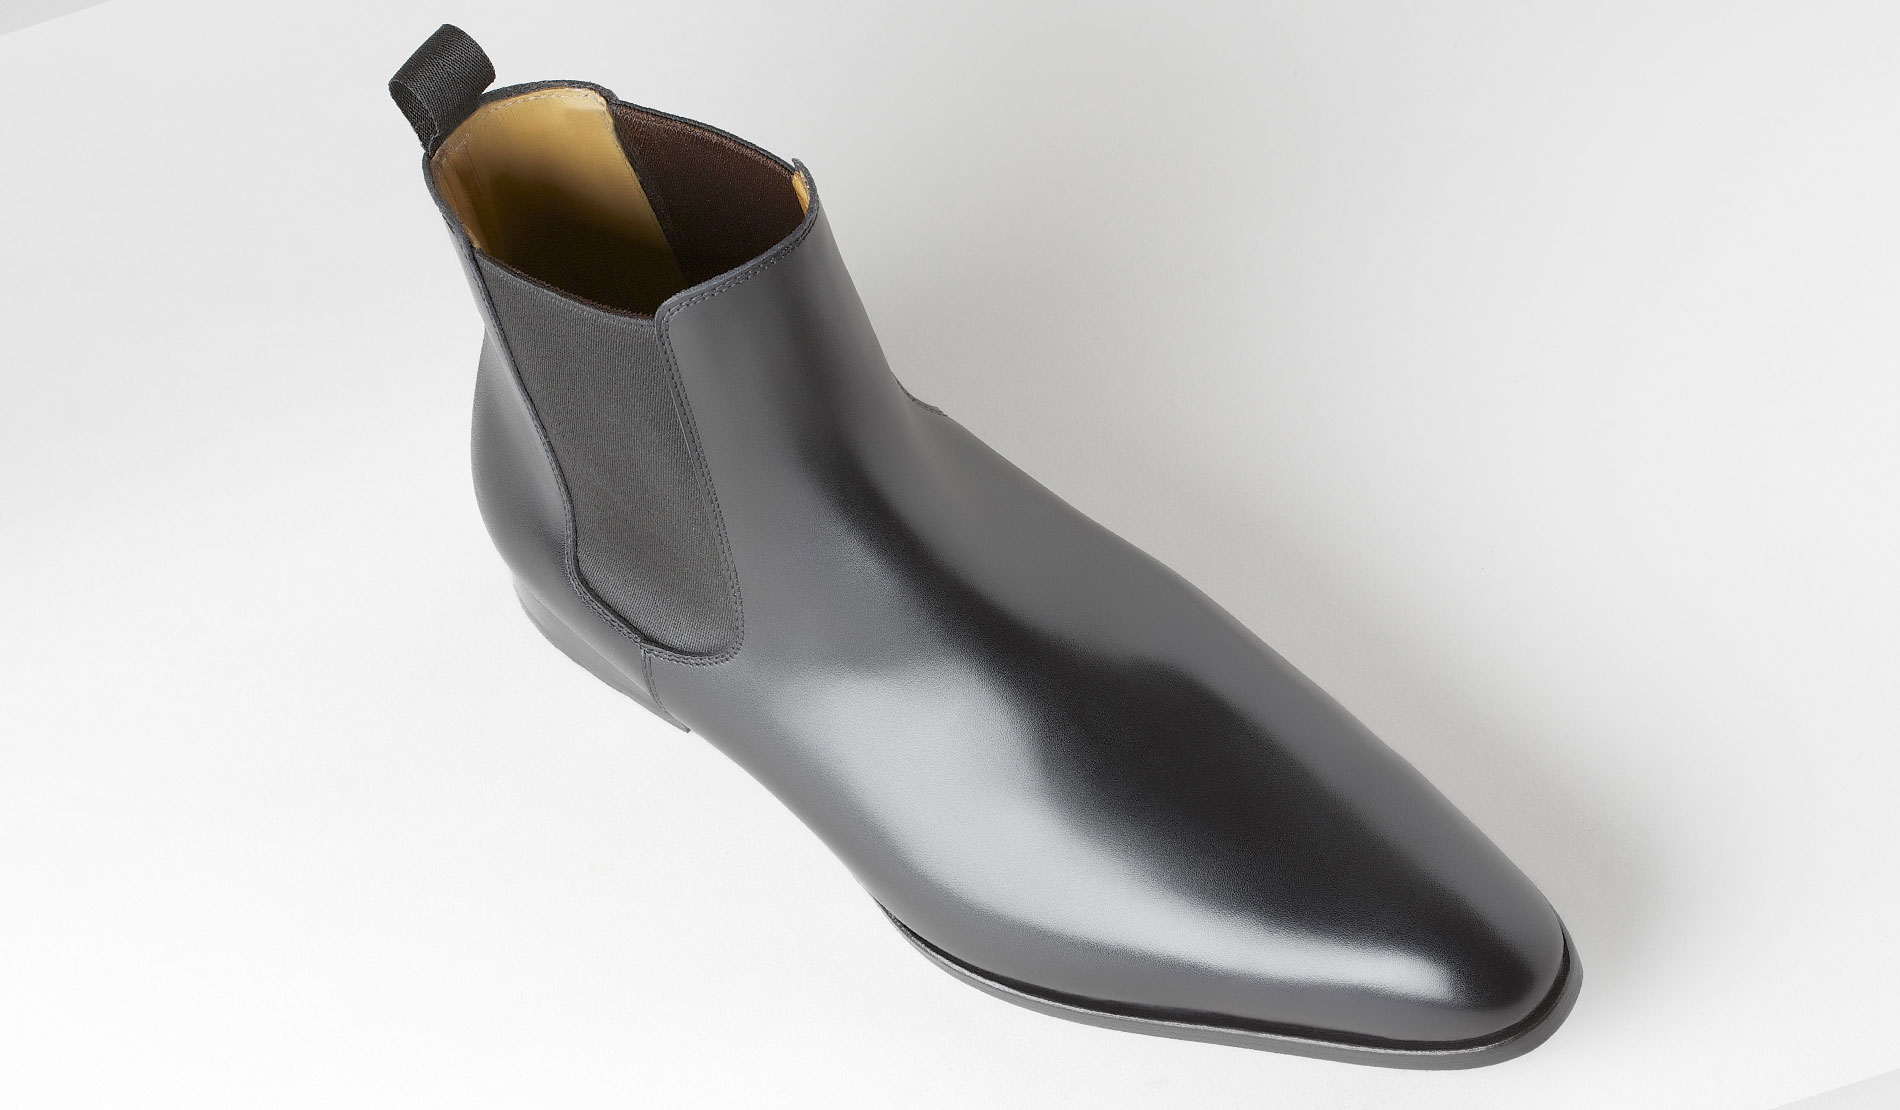 chaussure en daim traduction anglais. Black Bedroom Furniture Sets. Home Design Ideas